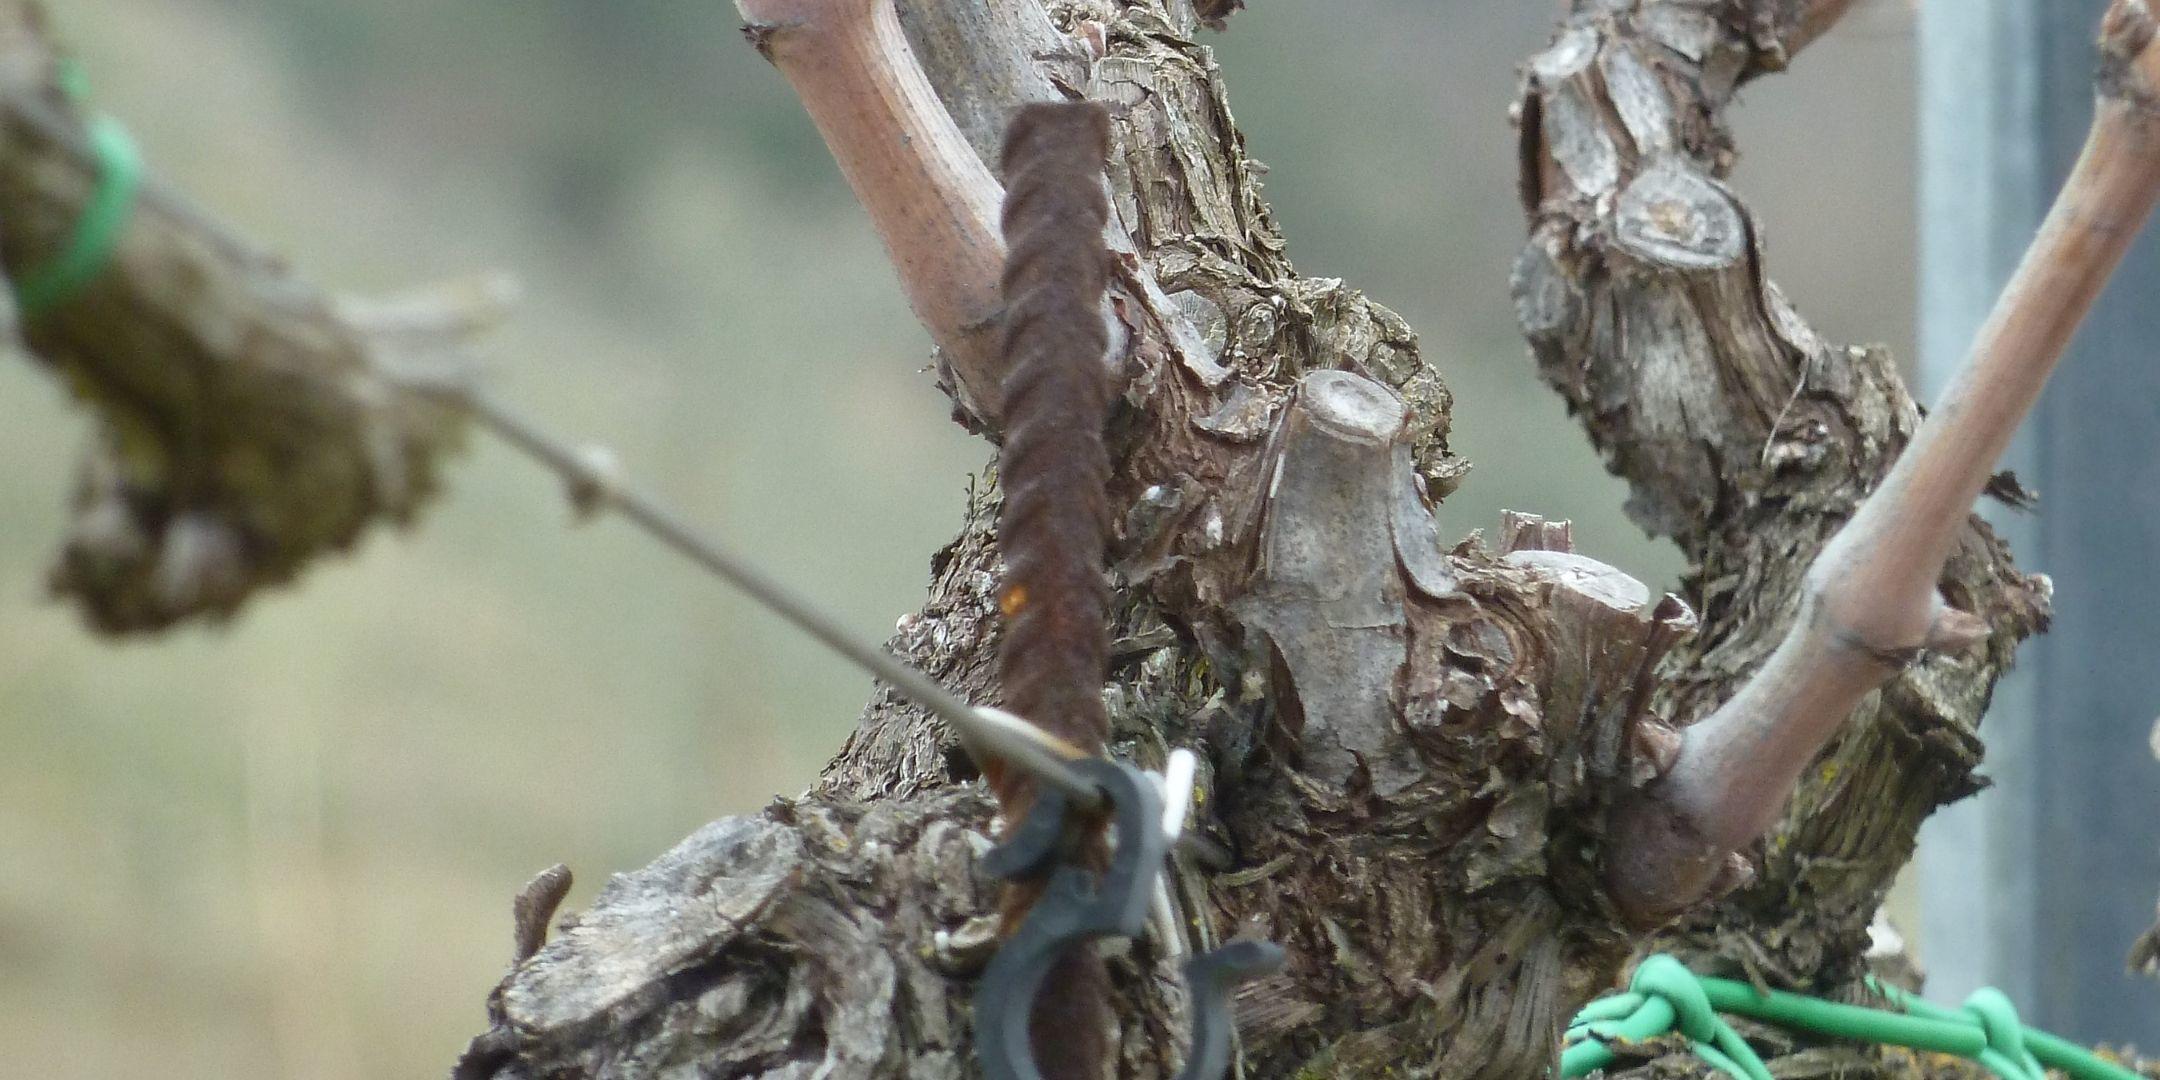 marco merli vines